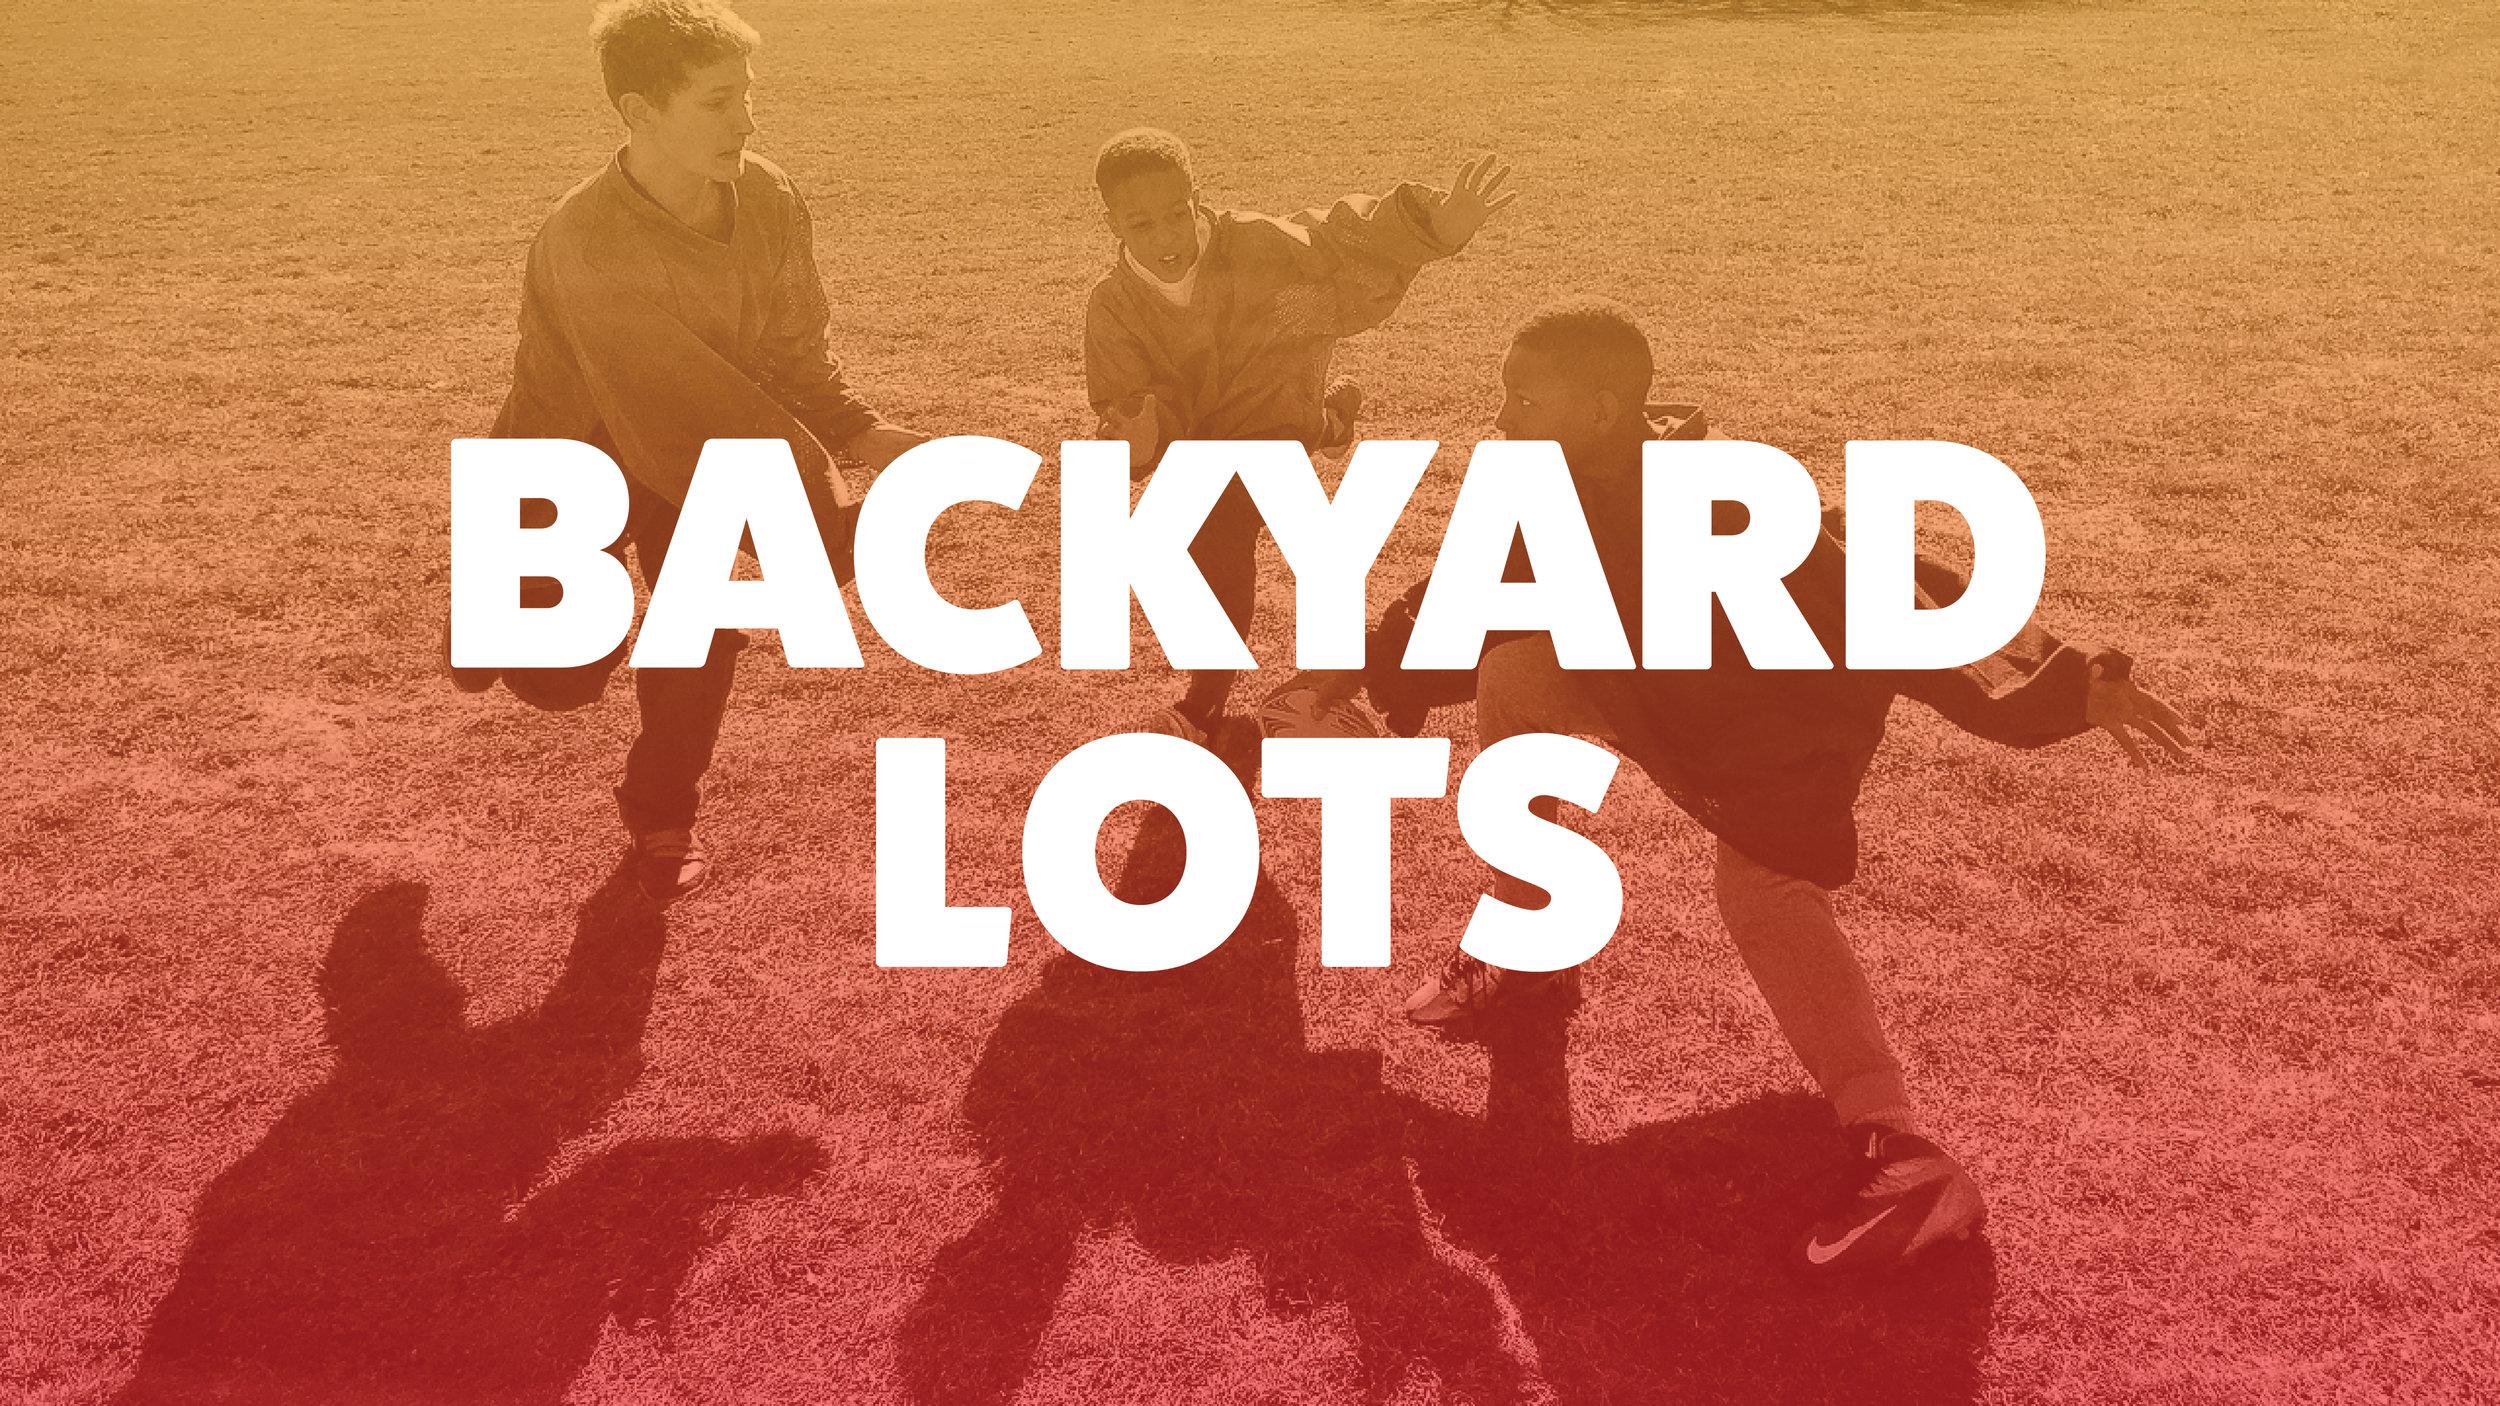 BackyardLots_1.jpg